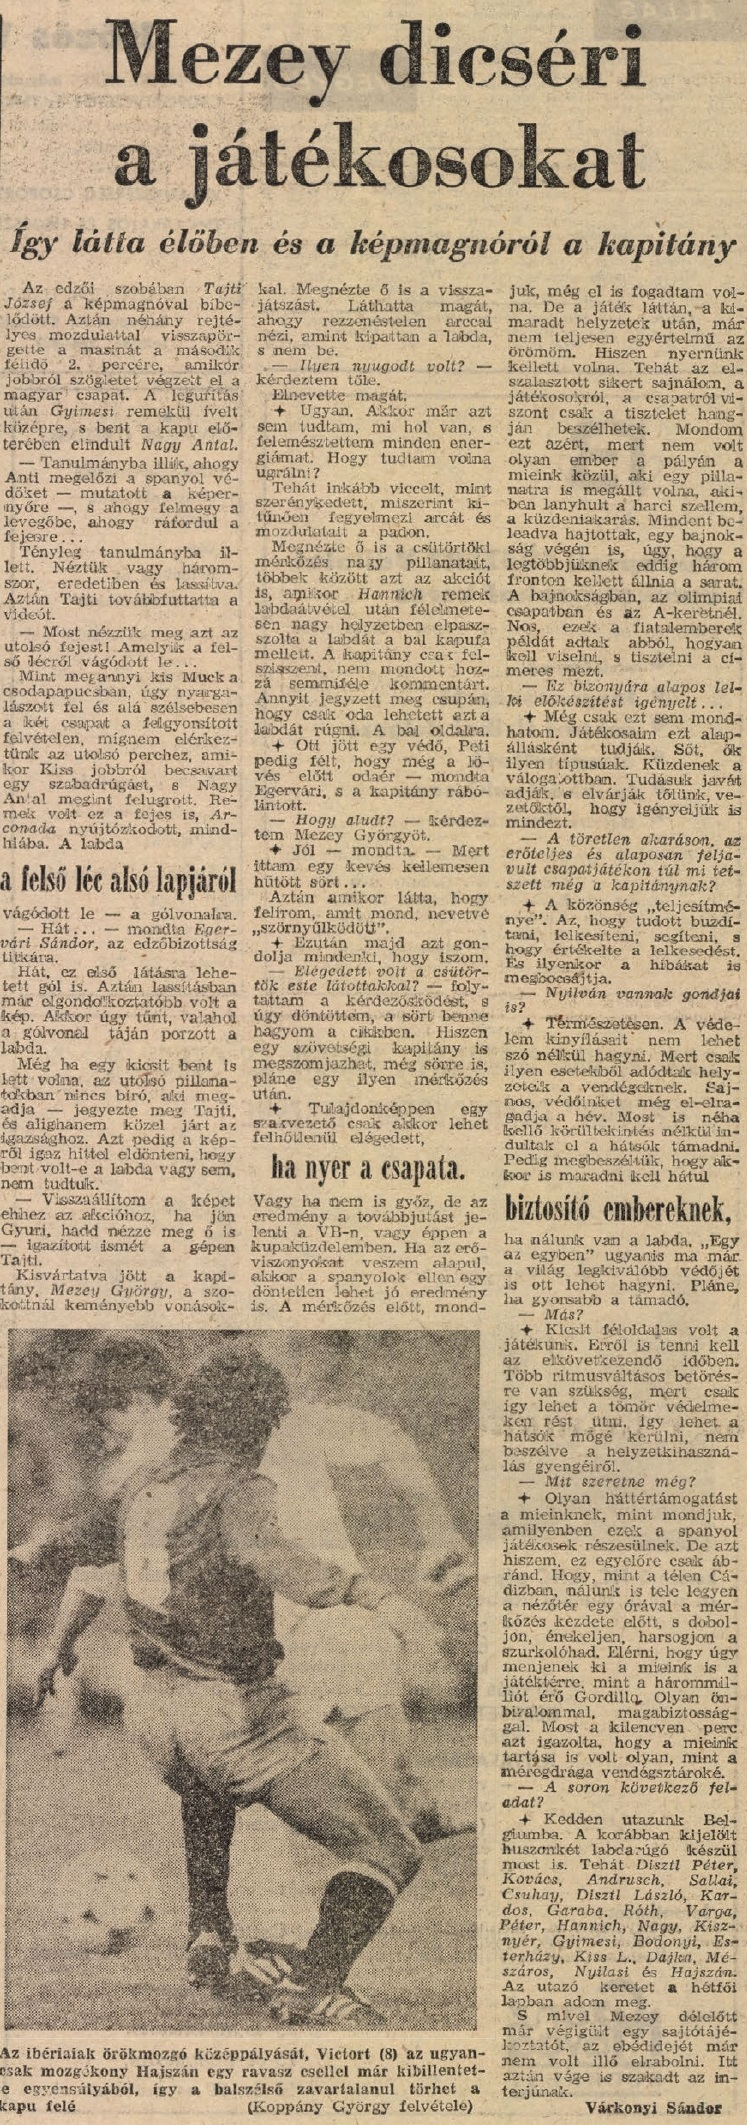 idokapszula_nb_i_1983_84_magyarorszag_spanyolorszag_merkozes_2.jpg